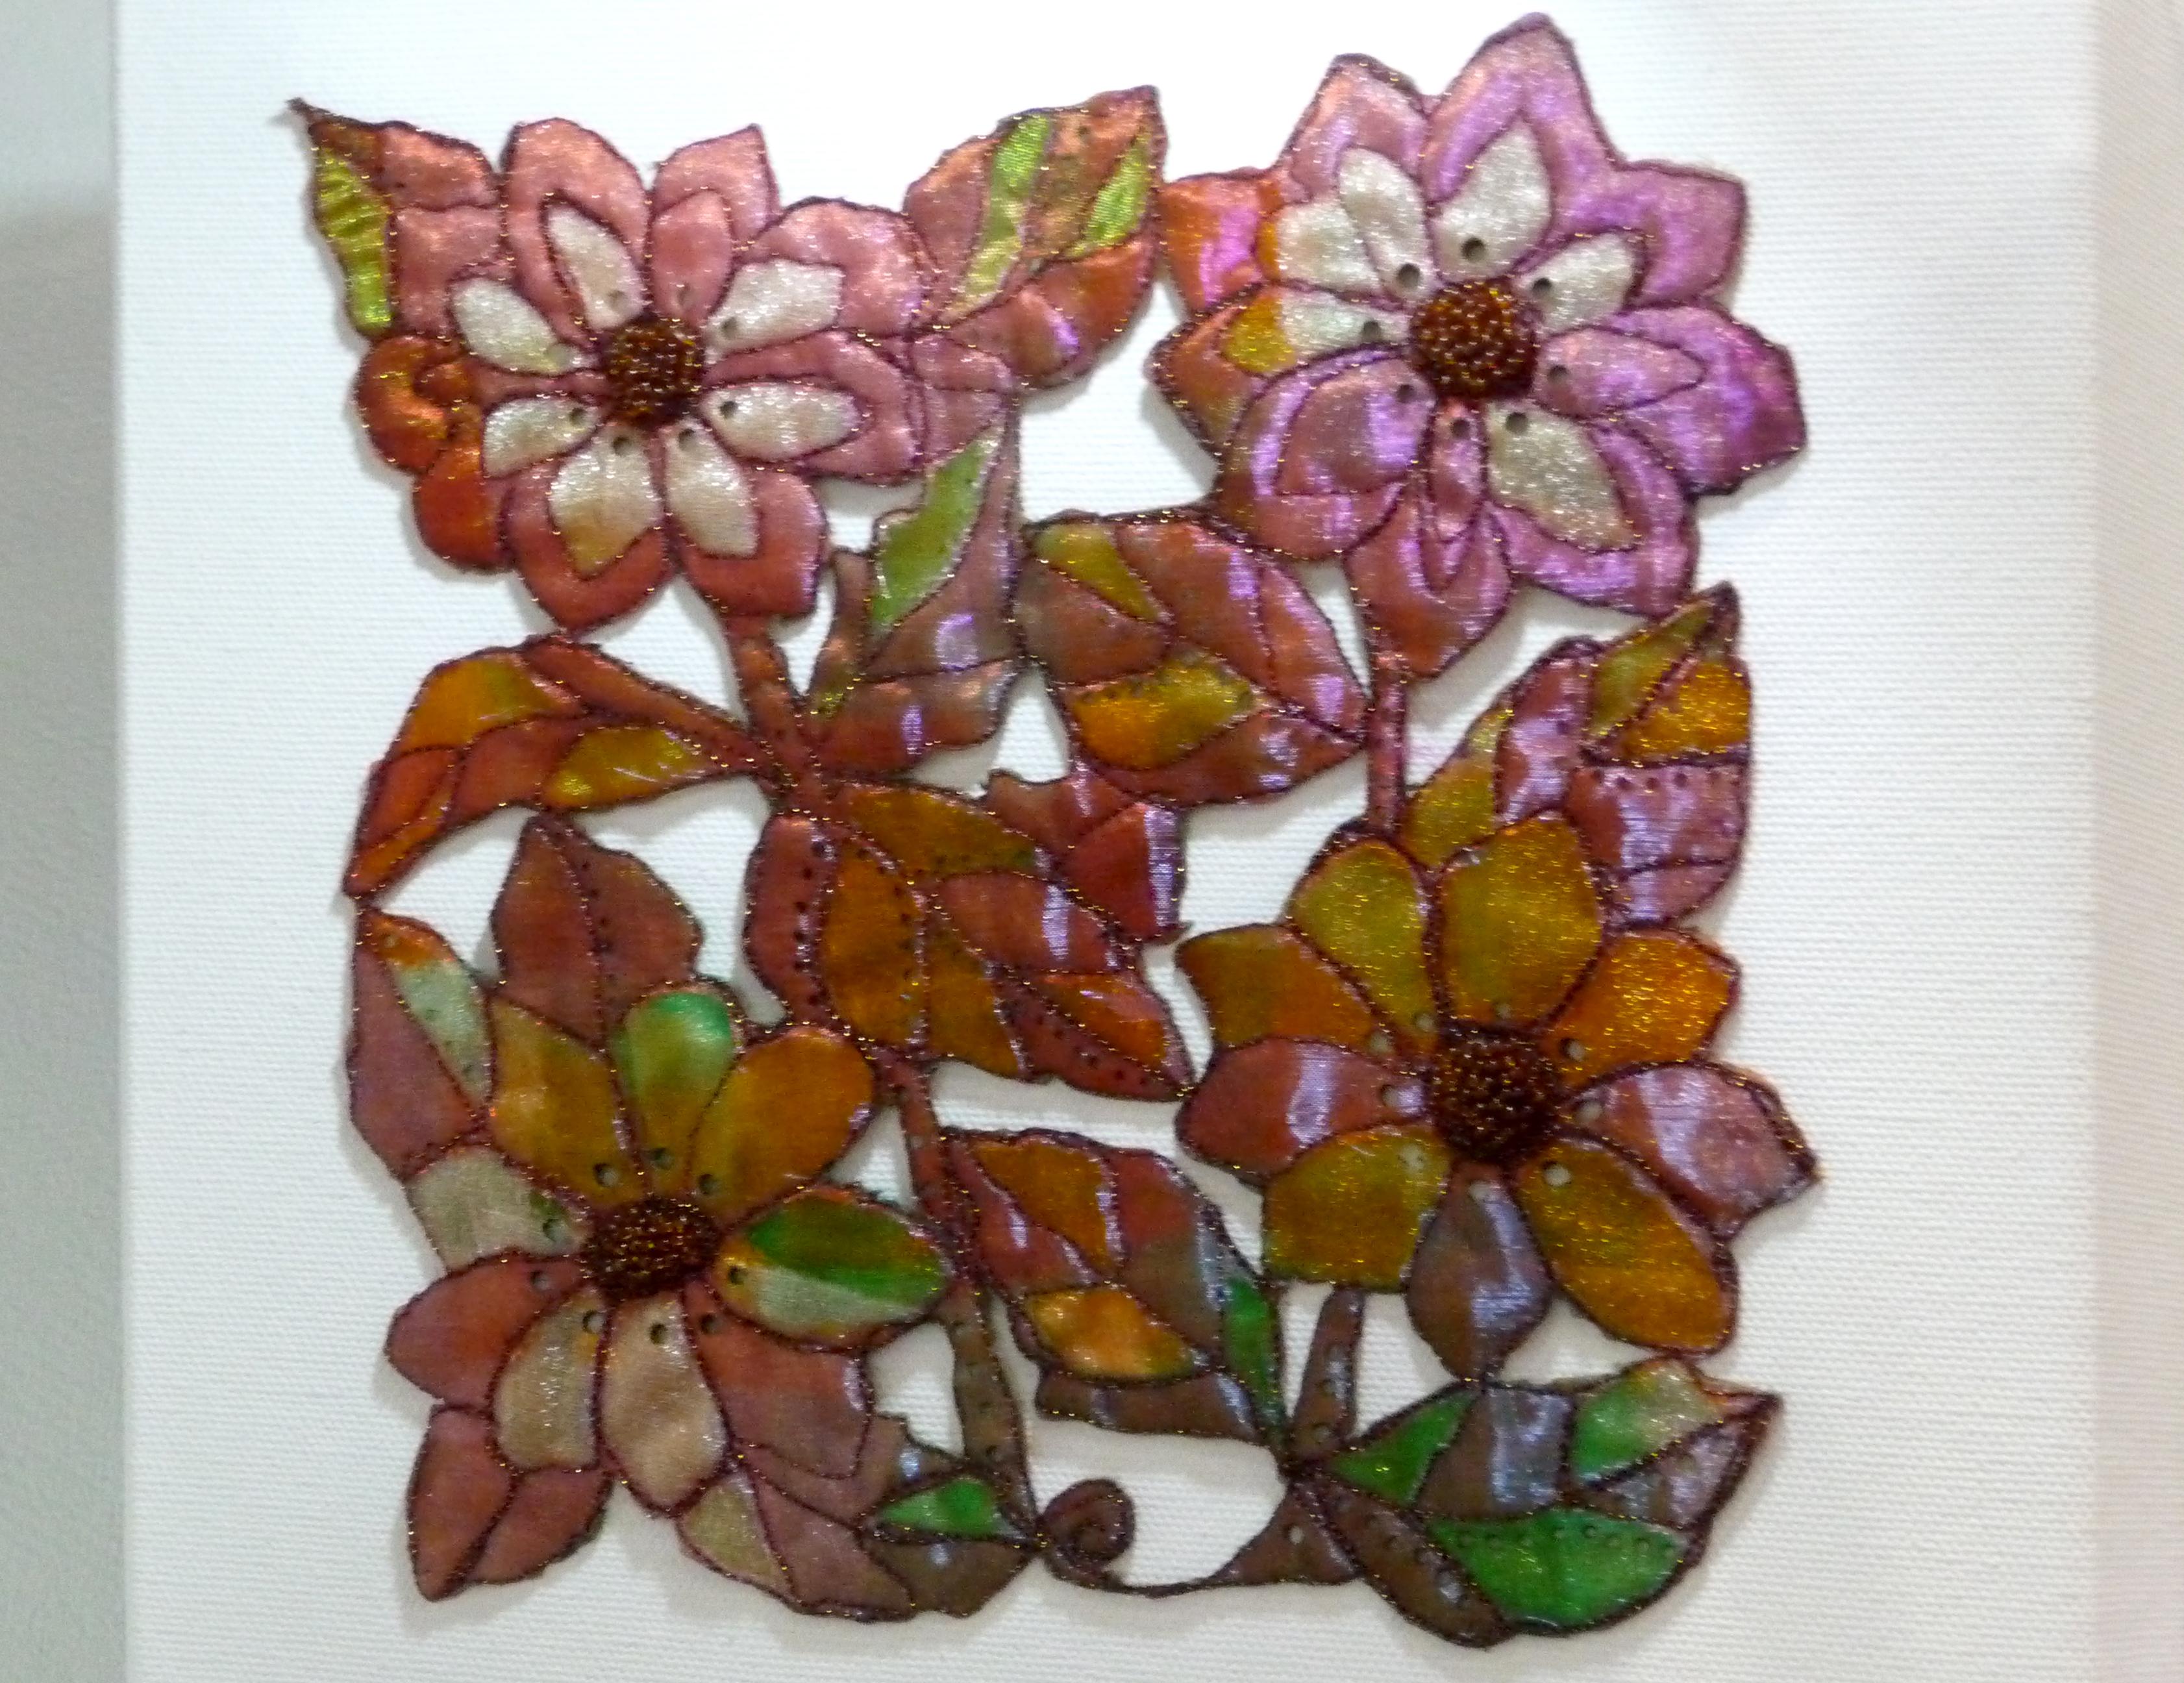 AUTUMN DELIGHT by Pamela Headon, free machine embroidery